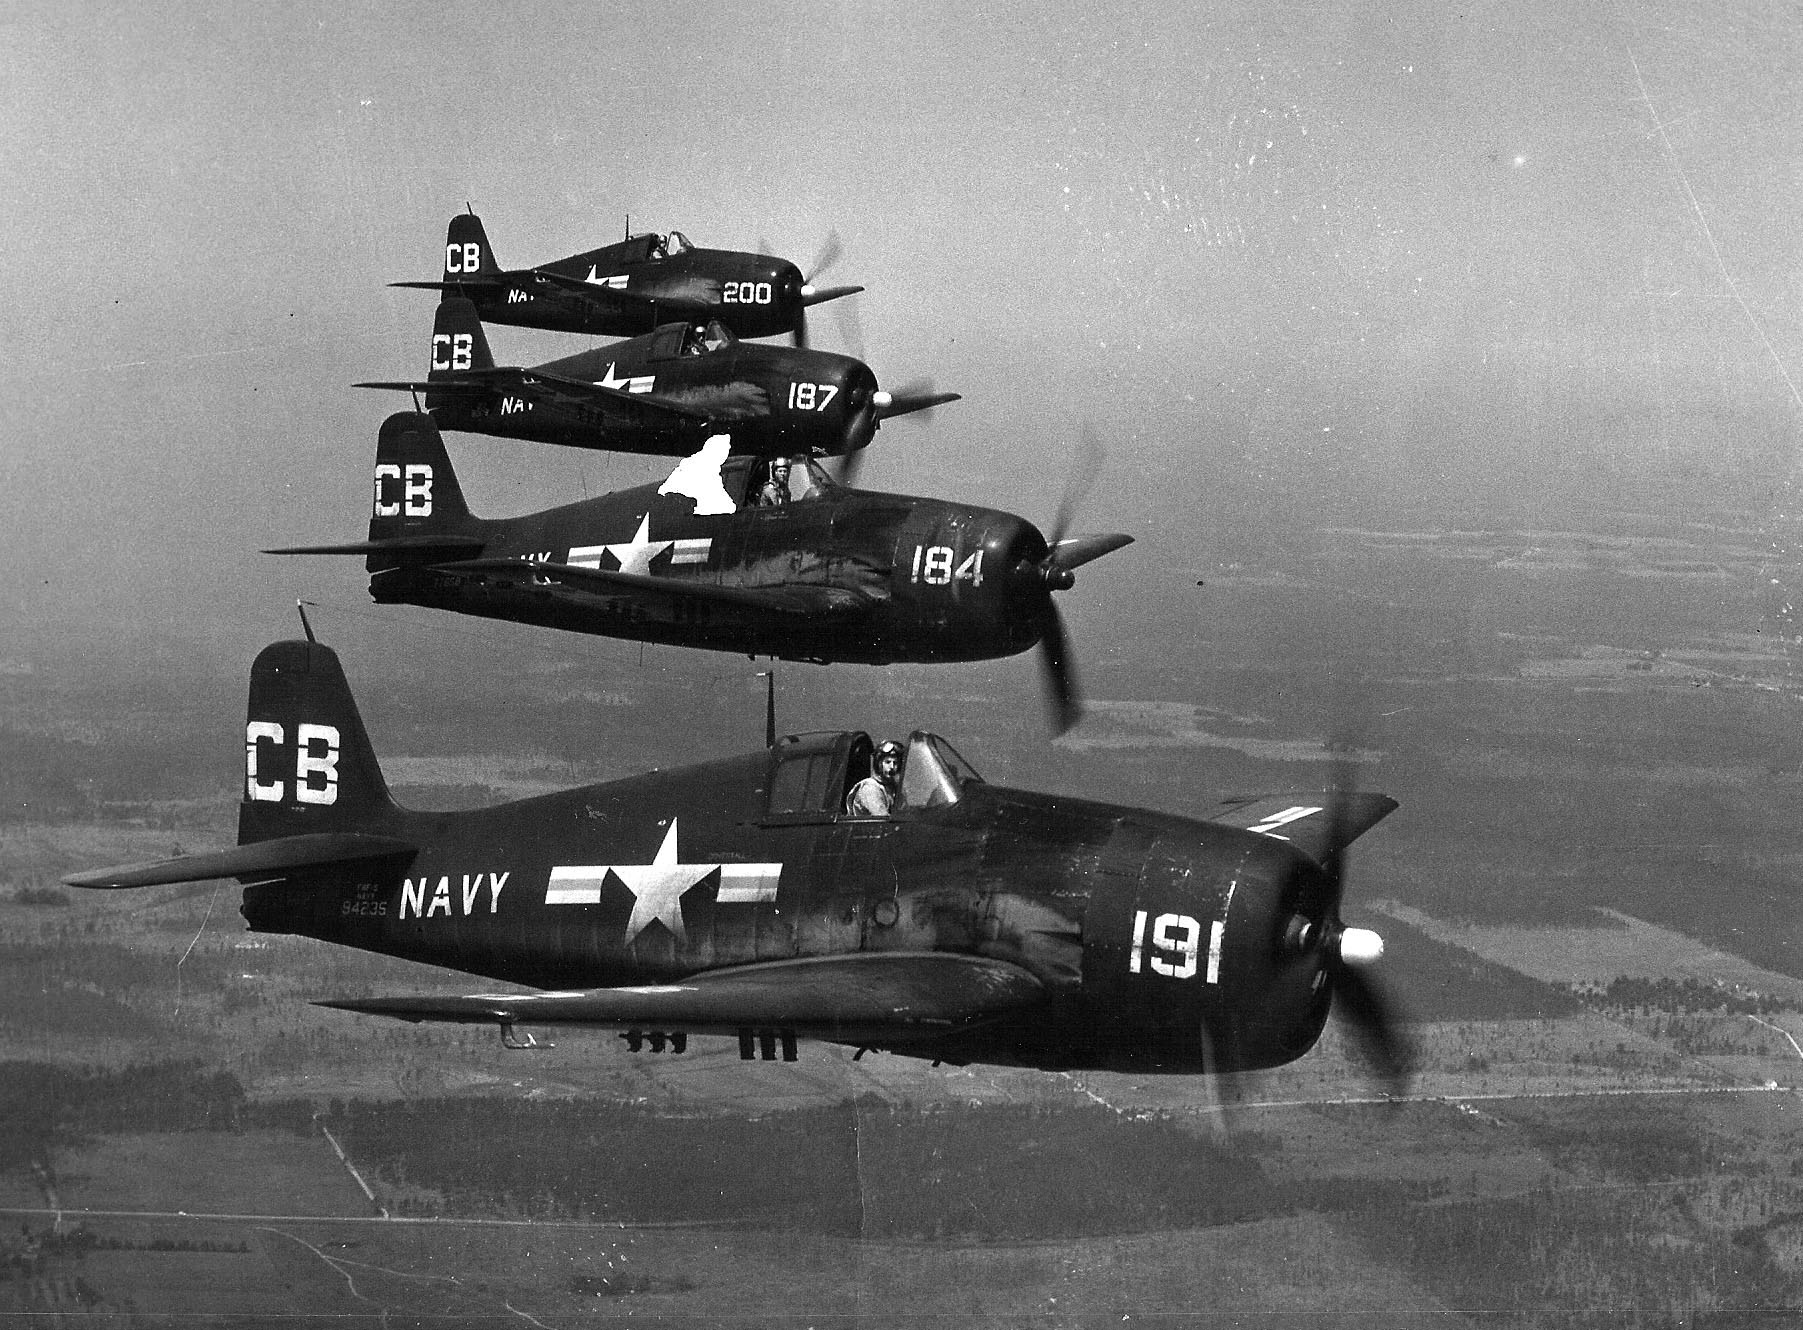 Grumman F6F 5 Hellcat NAS White CB191 BuNo 94235, CB184, CB187 and CB200 NAS Saufley Field FL 01